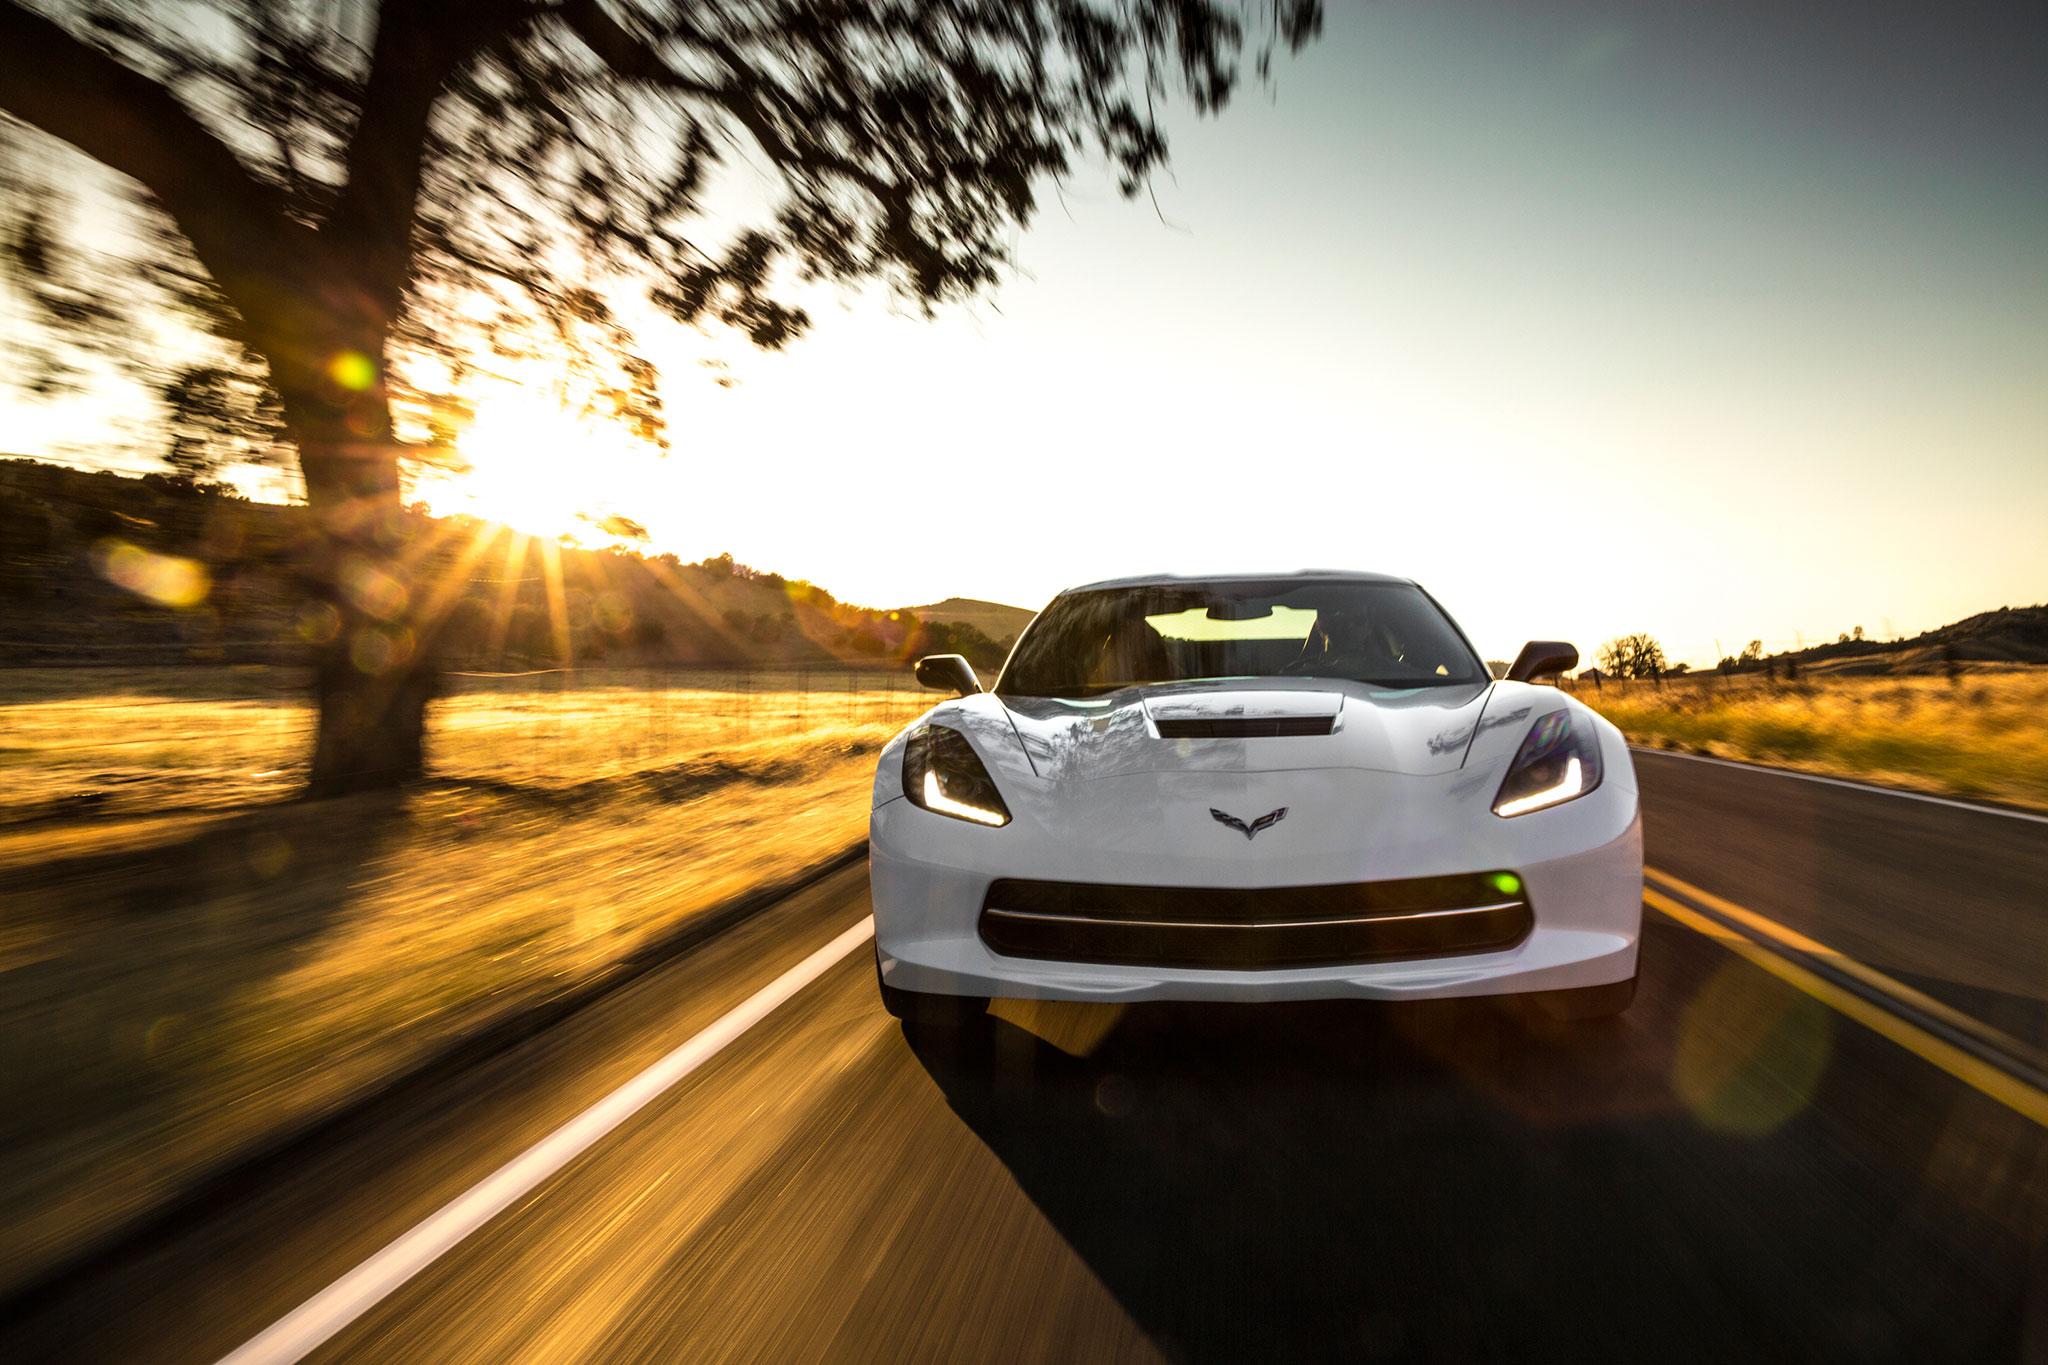 2014 Chevrolet Corvette Stingray Profile Front In Motion1